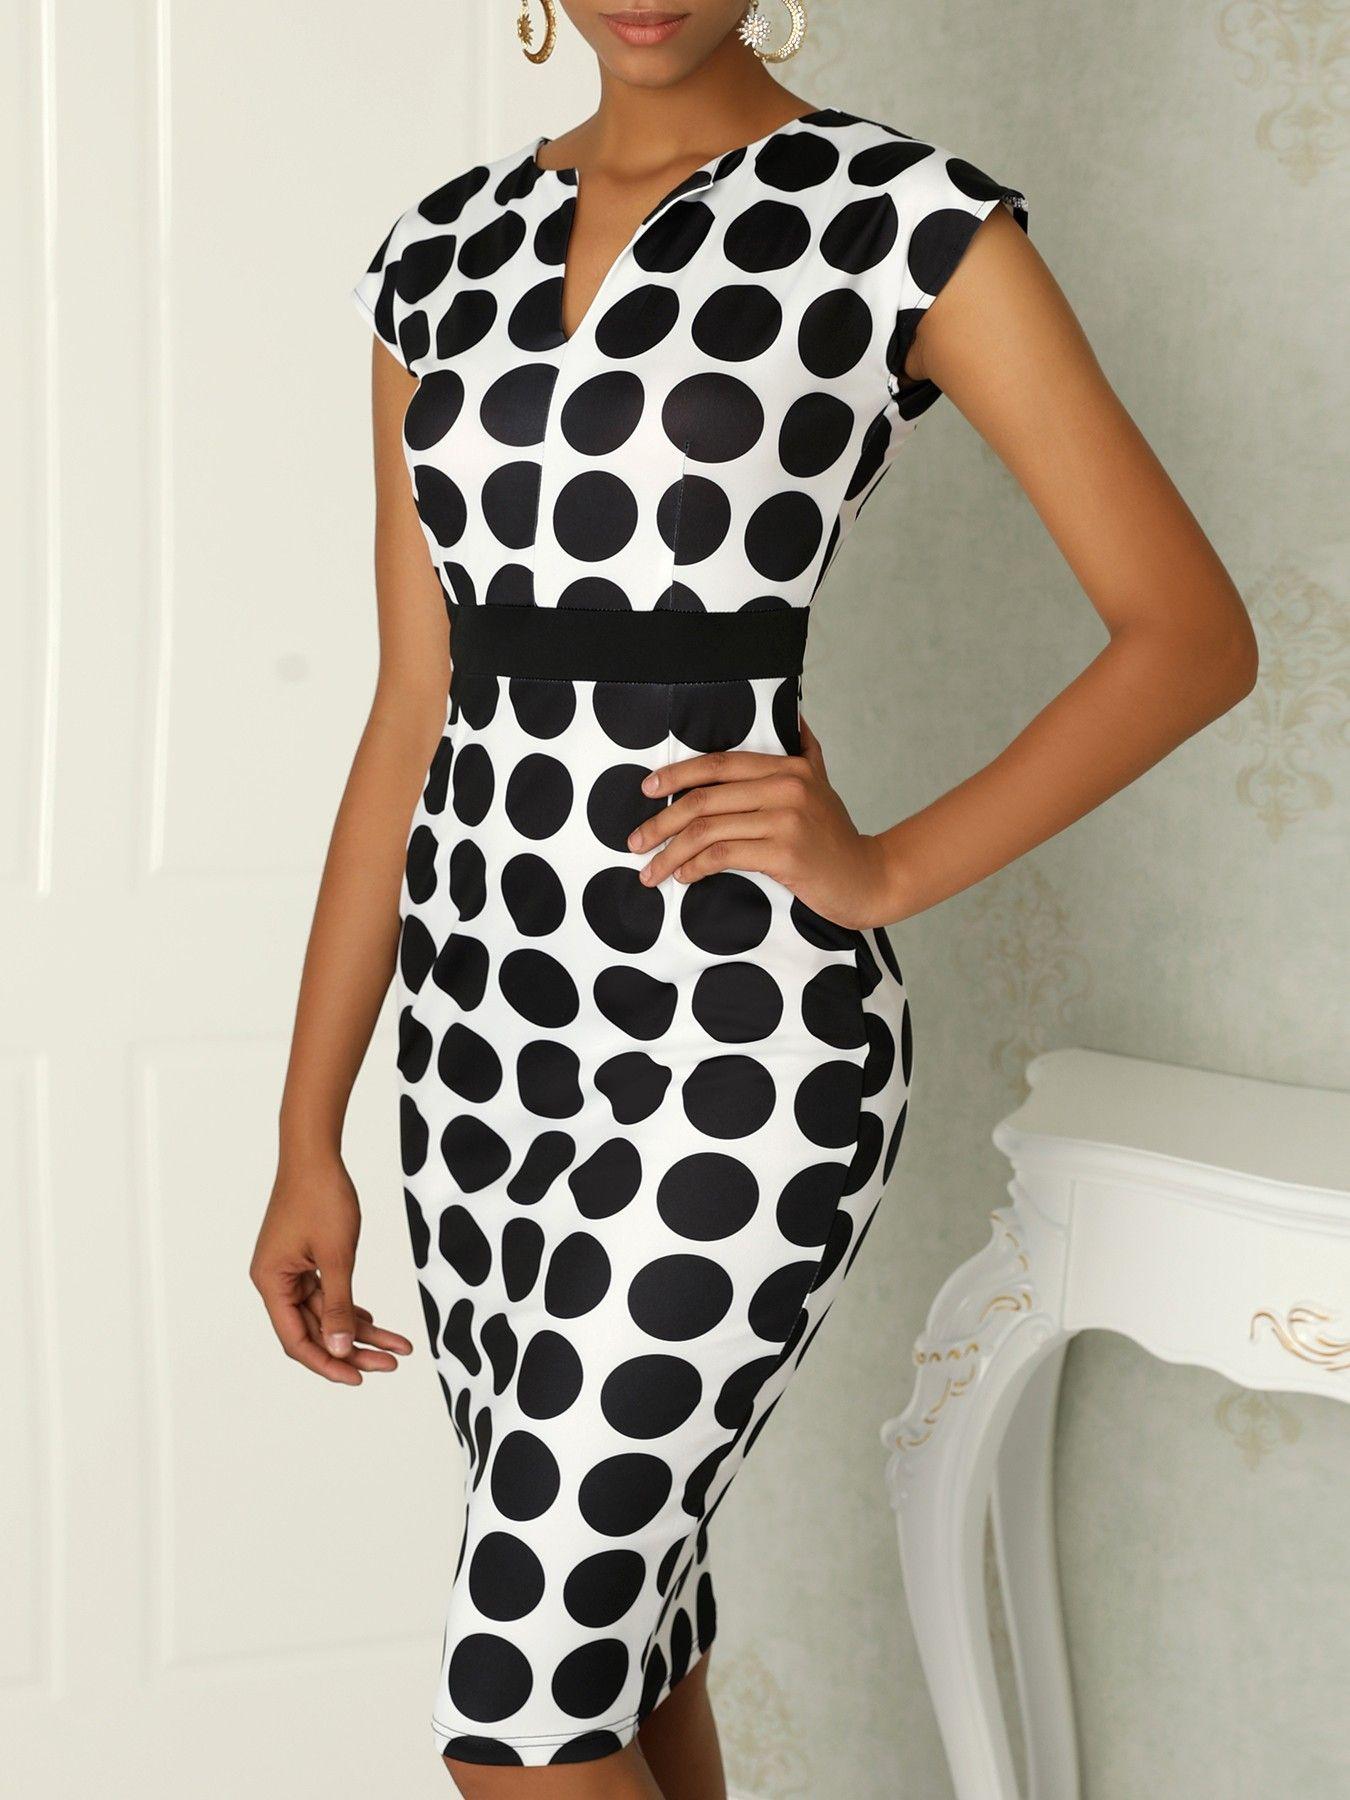 931acd8c1dedc Shop Women's Clothing, Dresses, Bodycon $27.99 – Discover sexy women ...